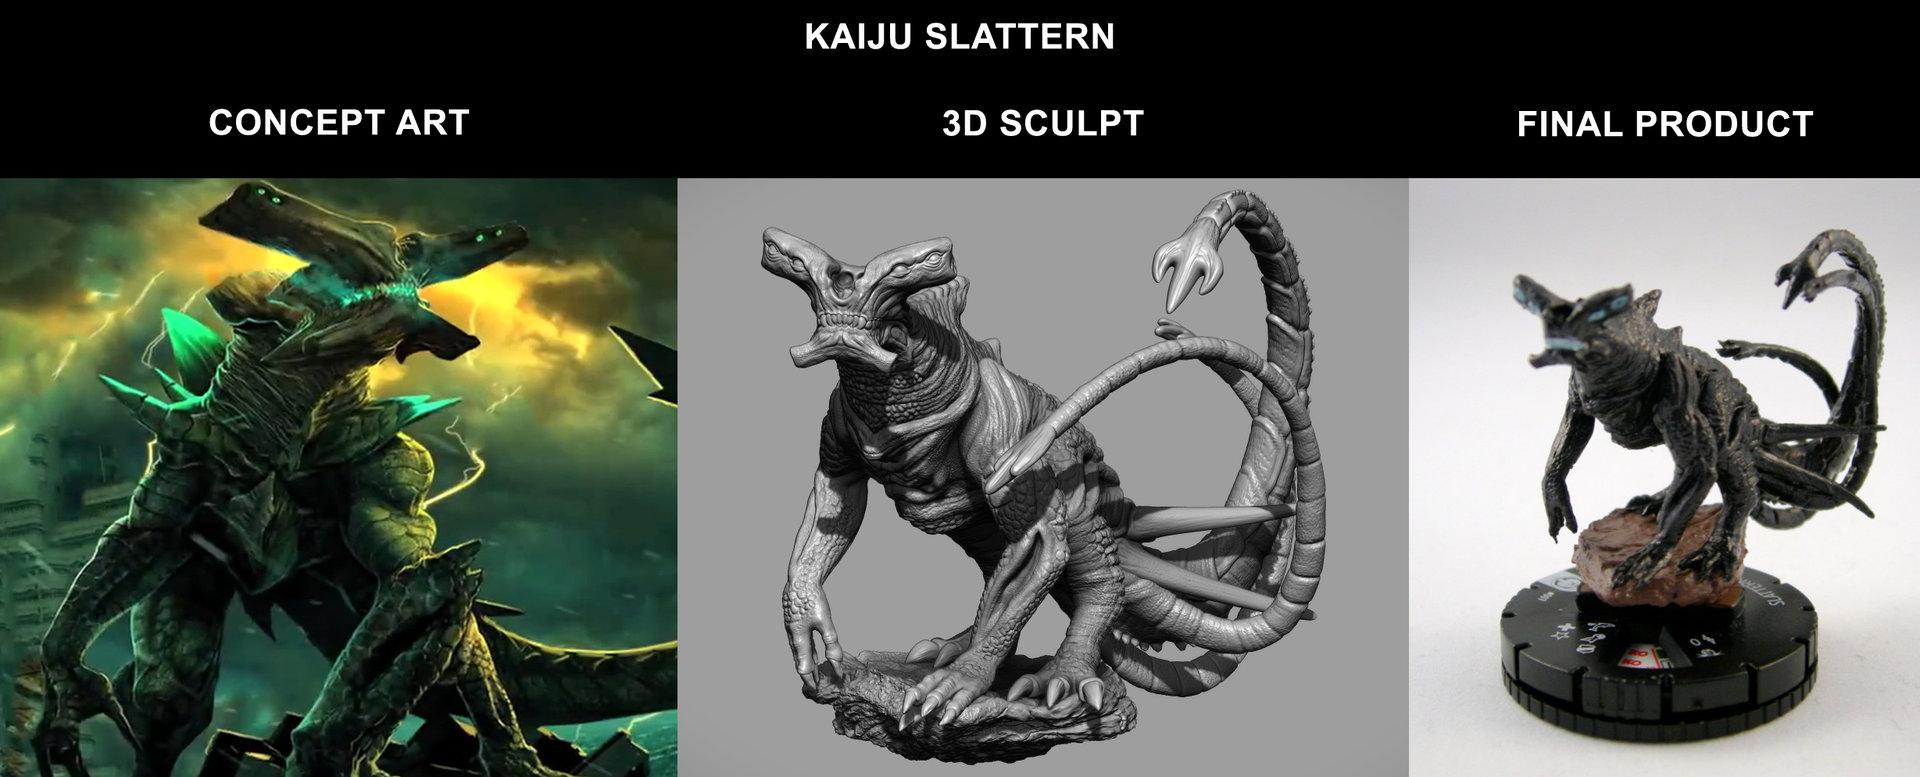 slattern kaiju gallery